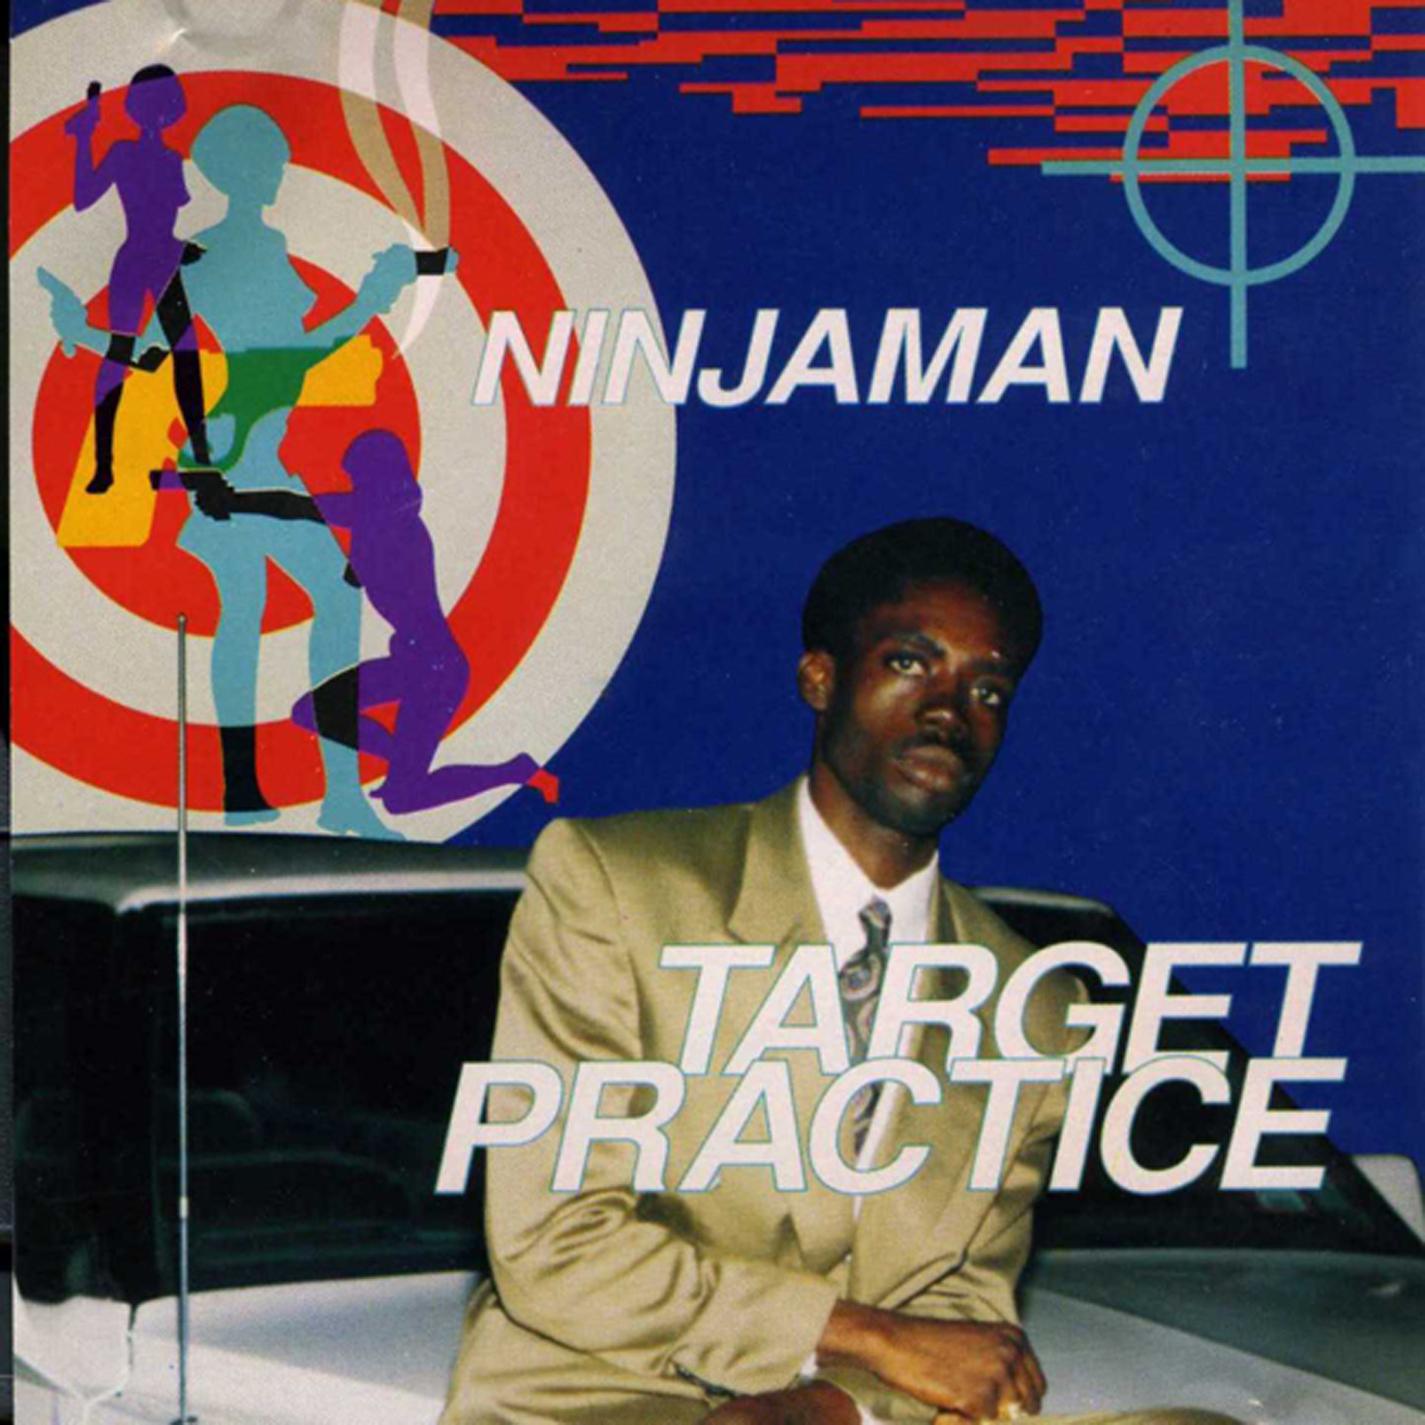 Ninjaman – Target Practice